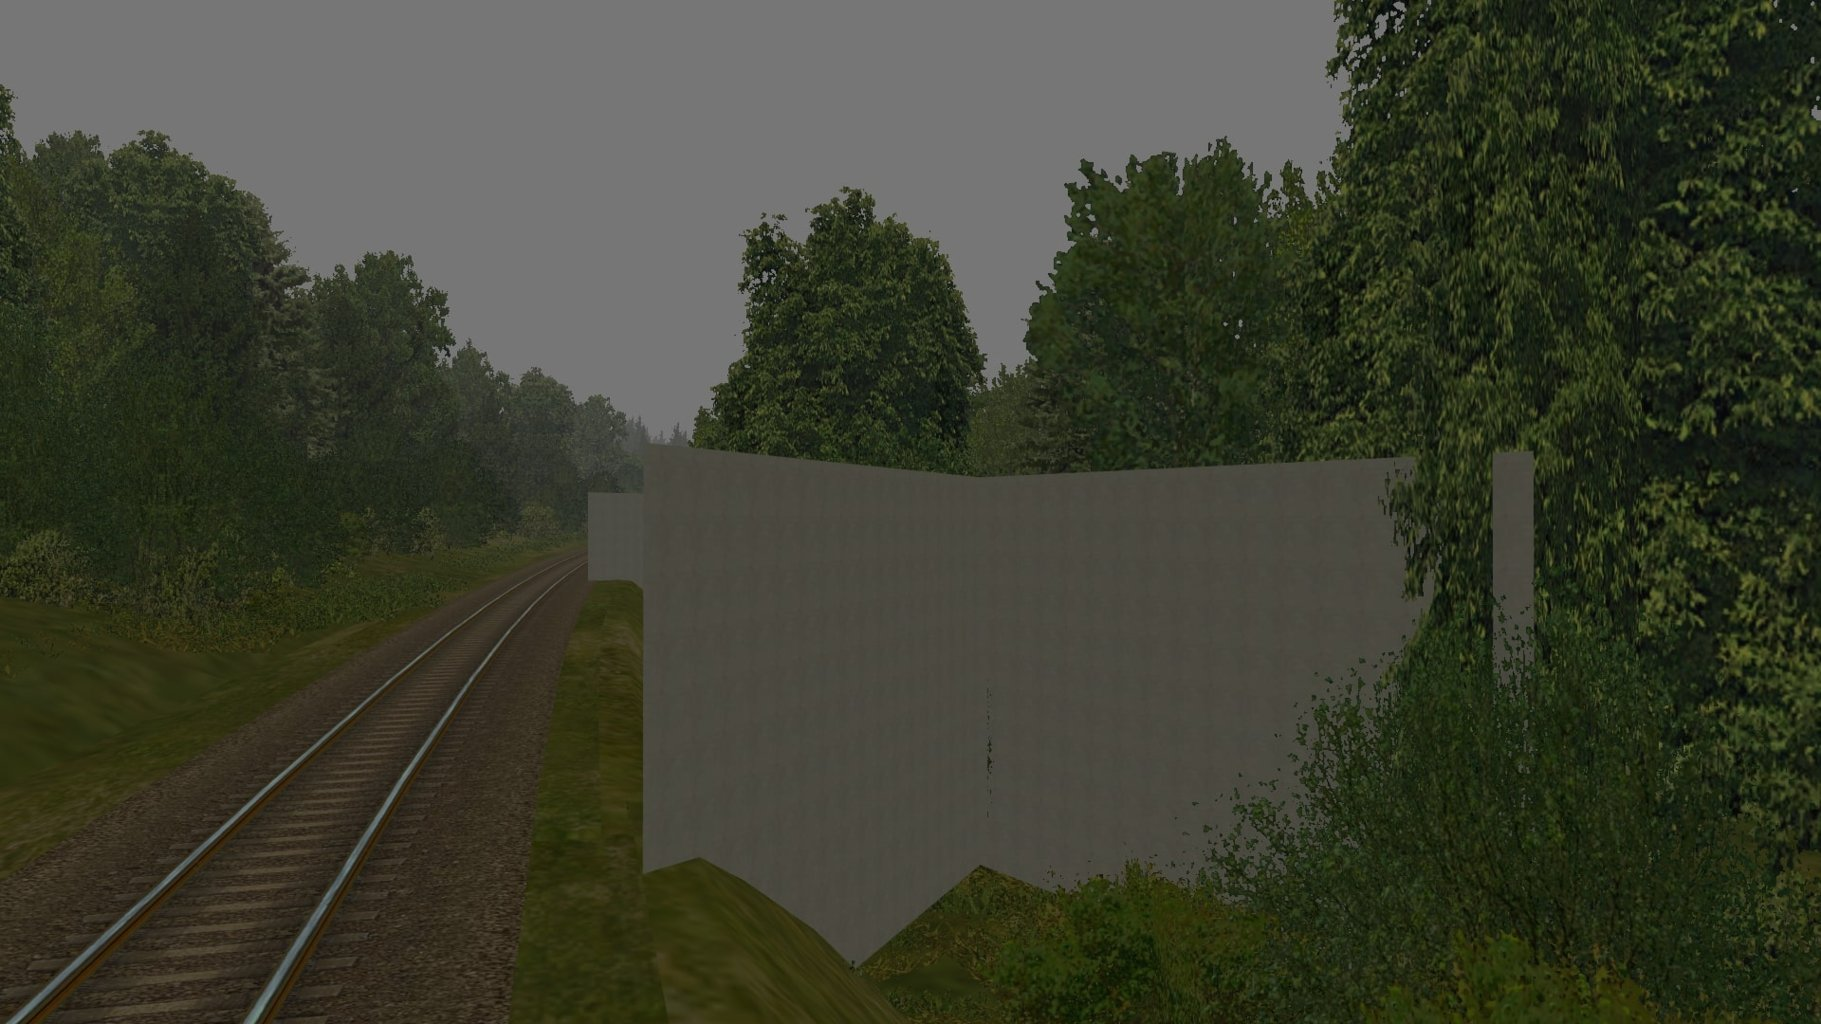 Open Rails 2021-04-20 11-09-45.jpg